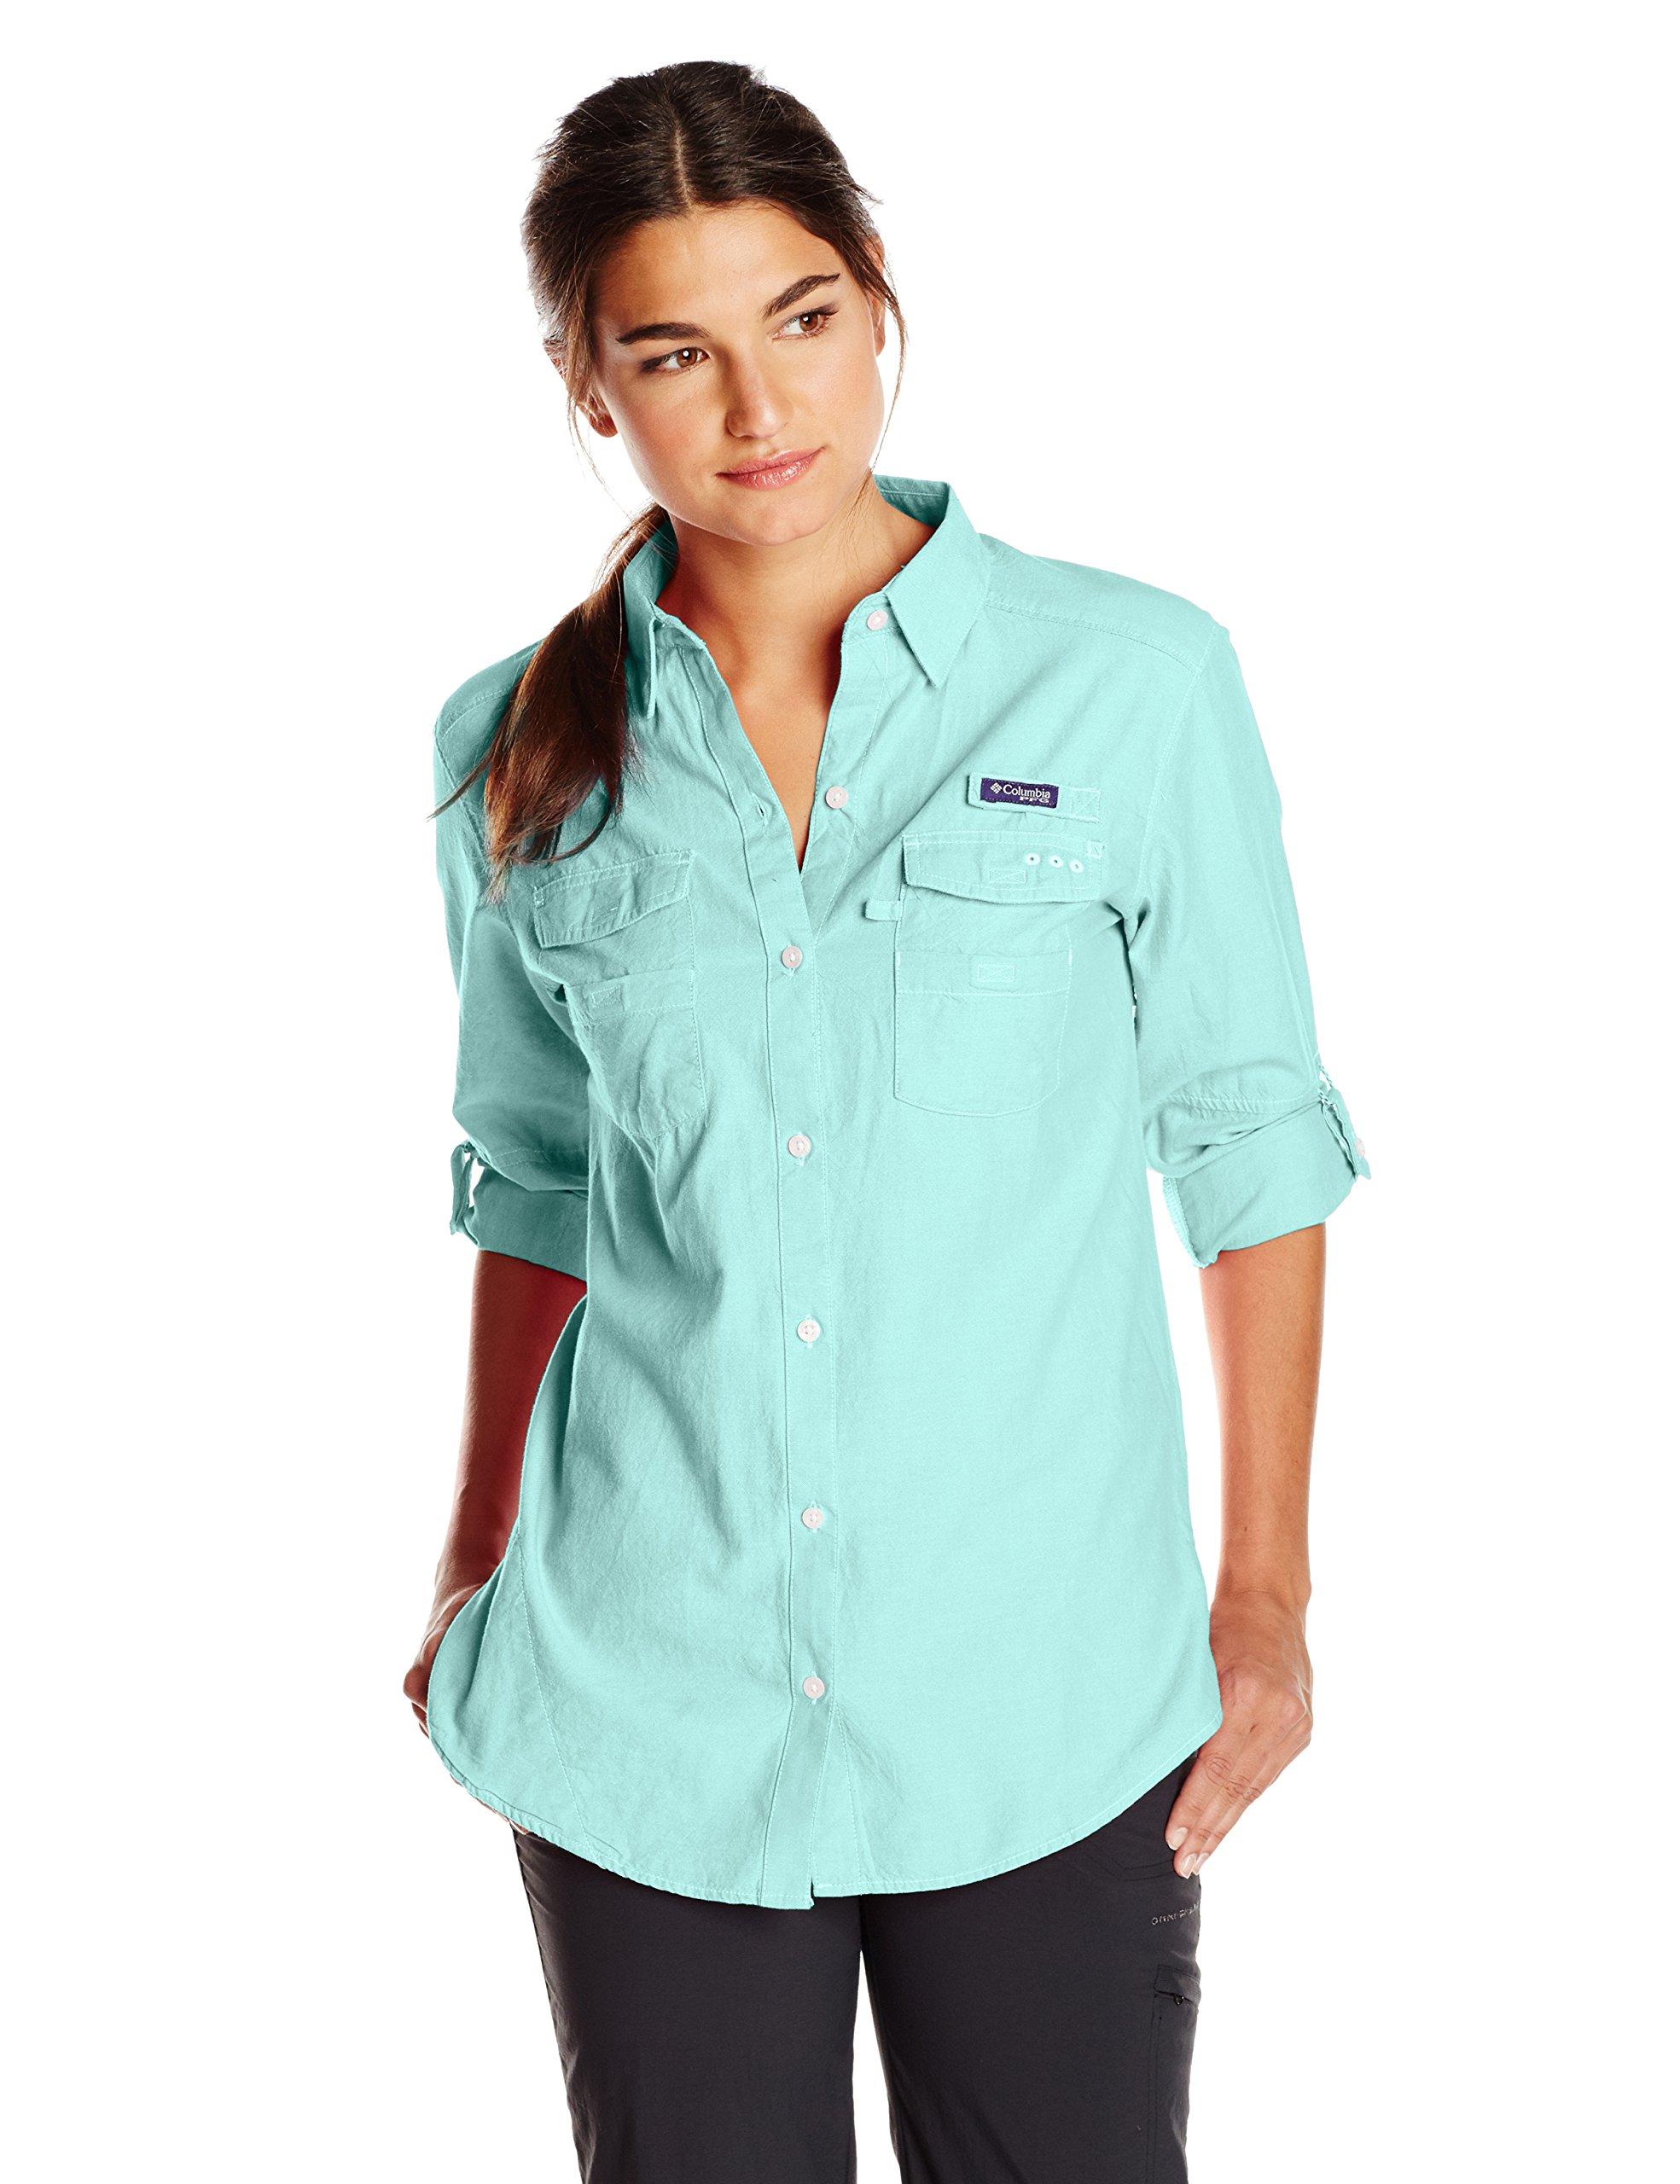 Columbia Women's Super Bonehead II Long Sleeve Shirt, Candy Mint Oxford, Medium